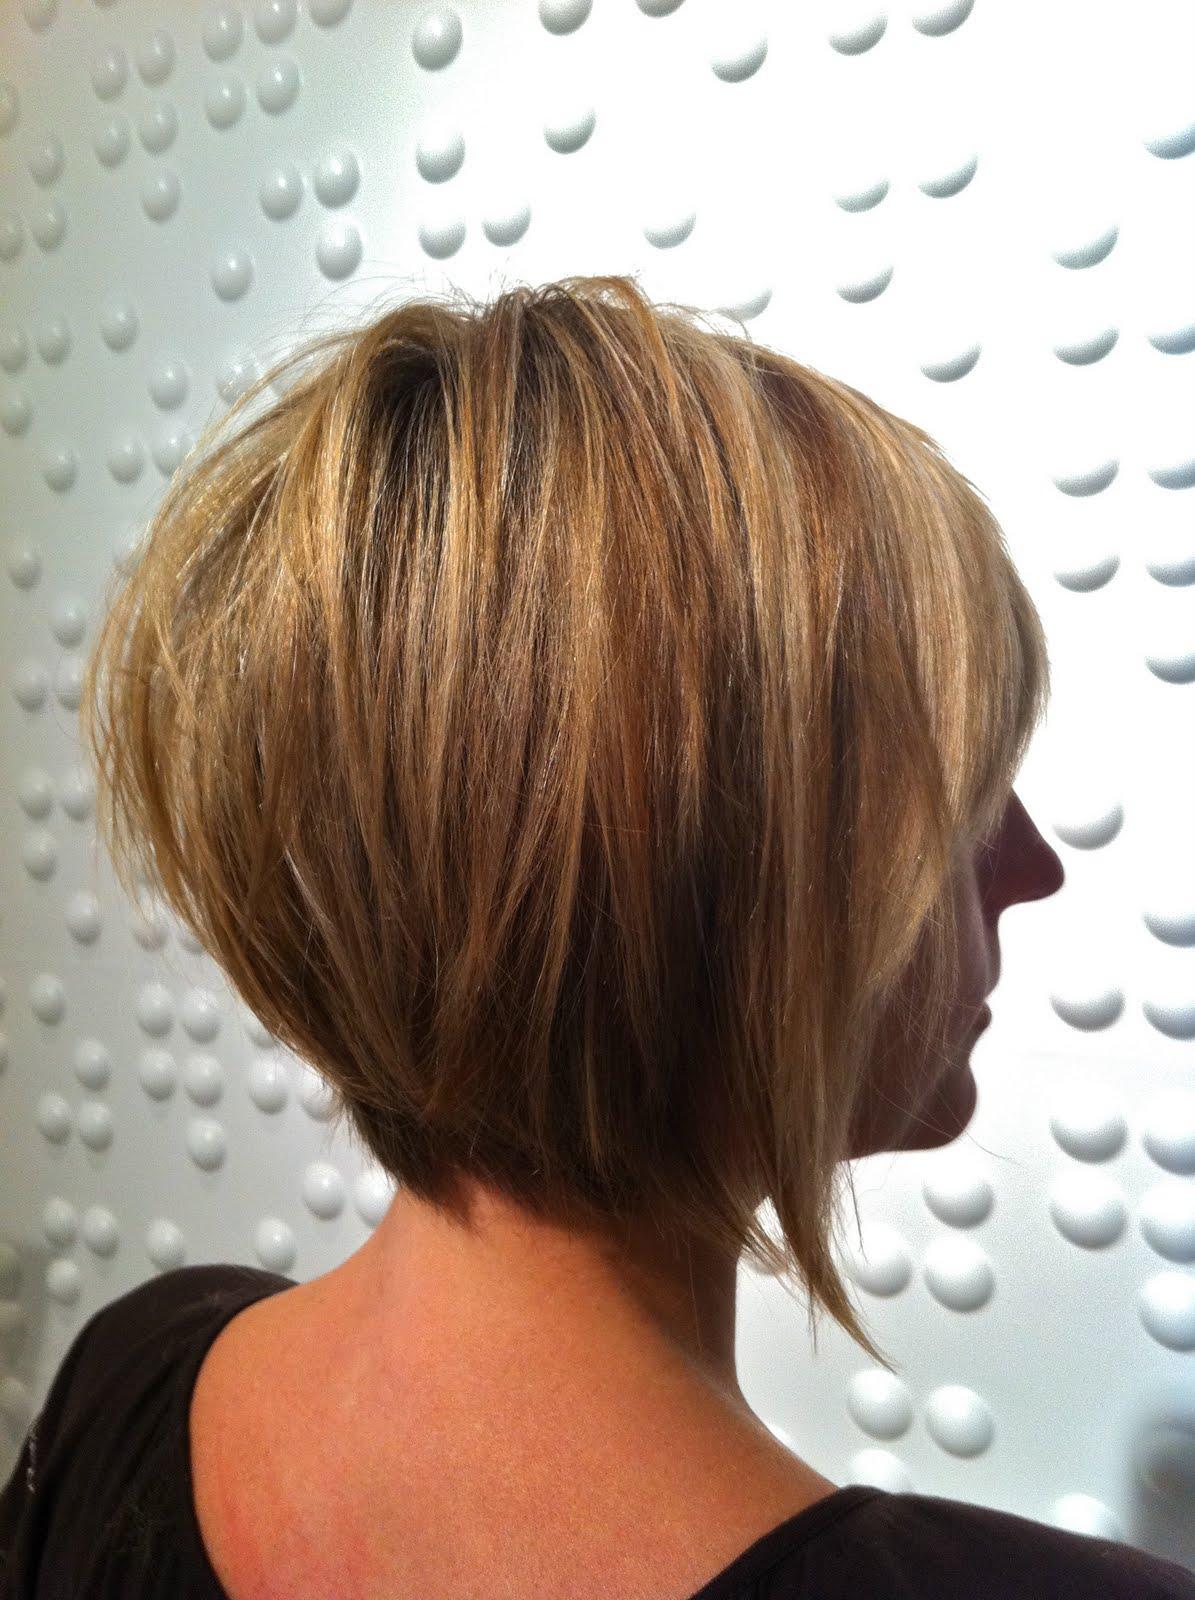 Стрижка боб каре на короткие волосы вид сзади